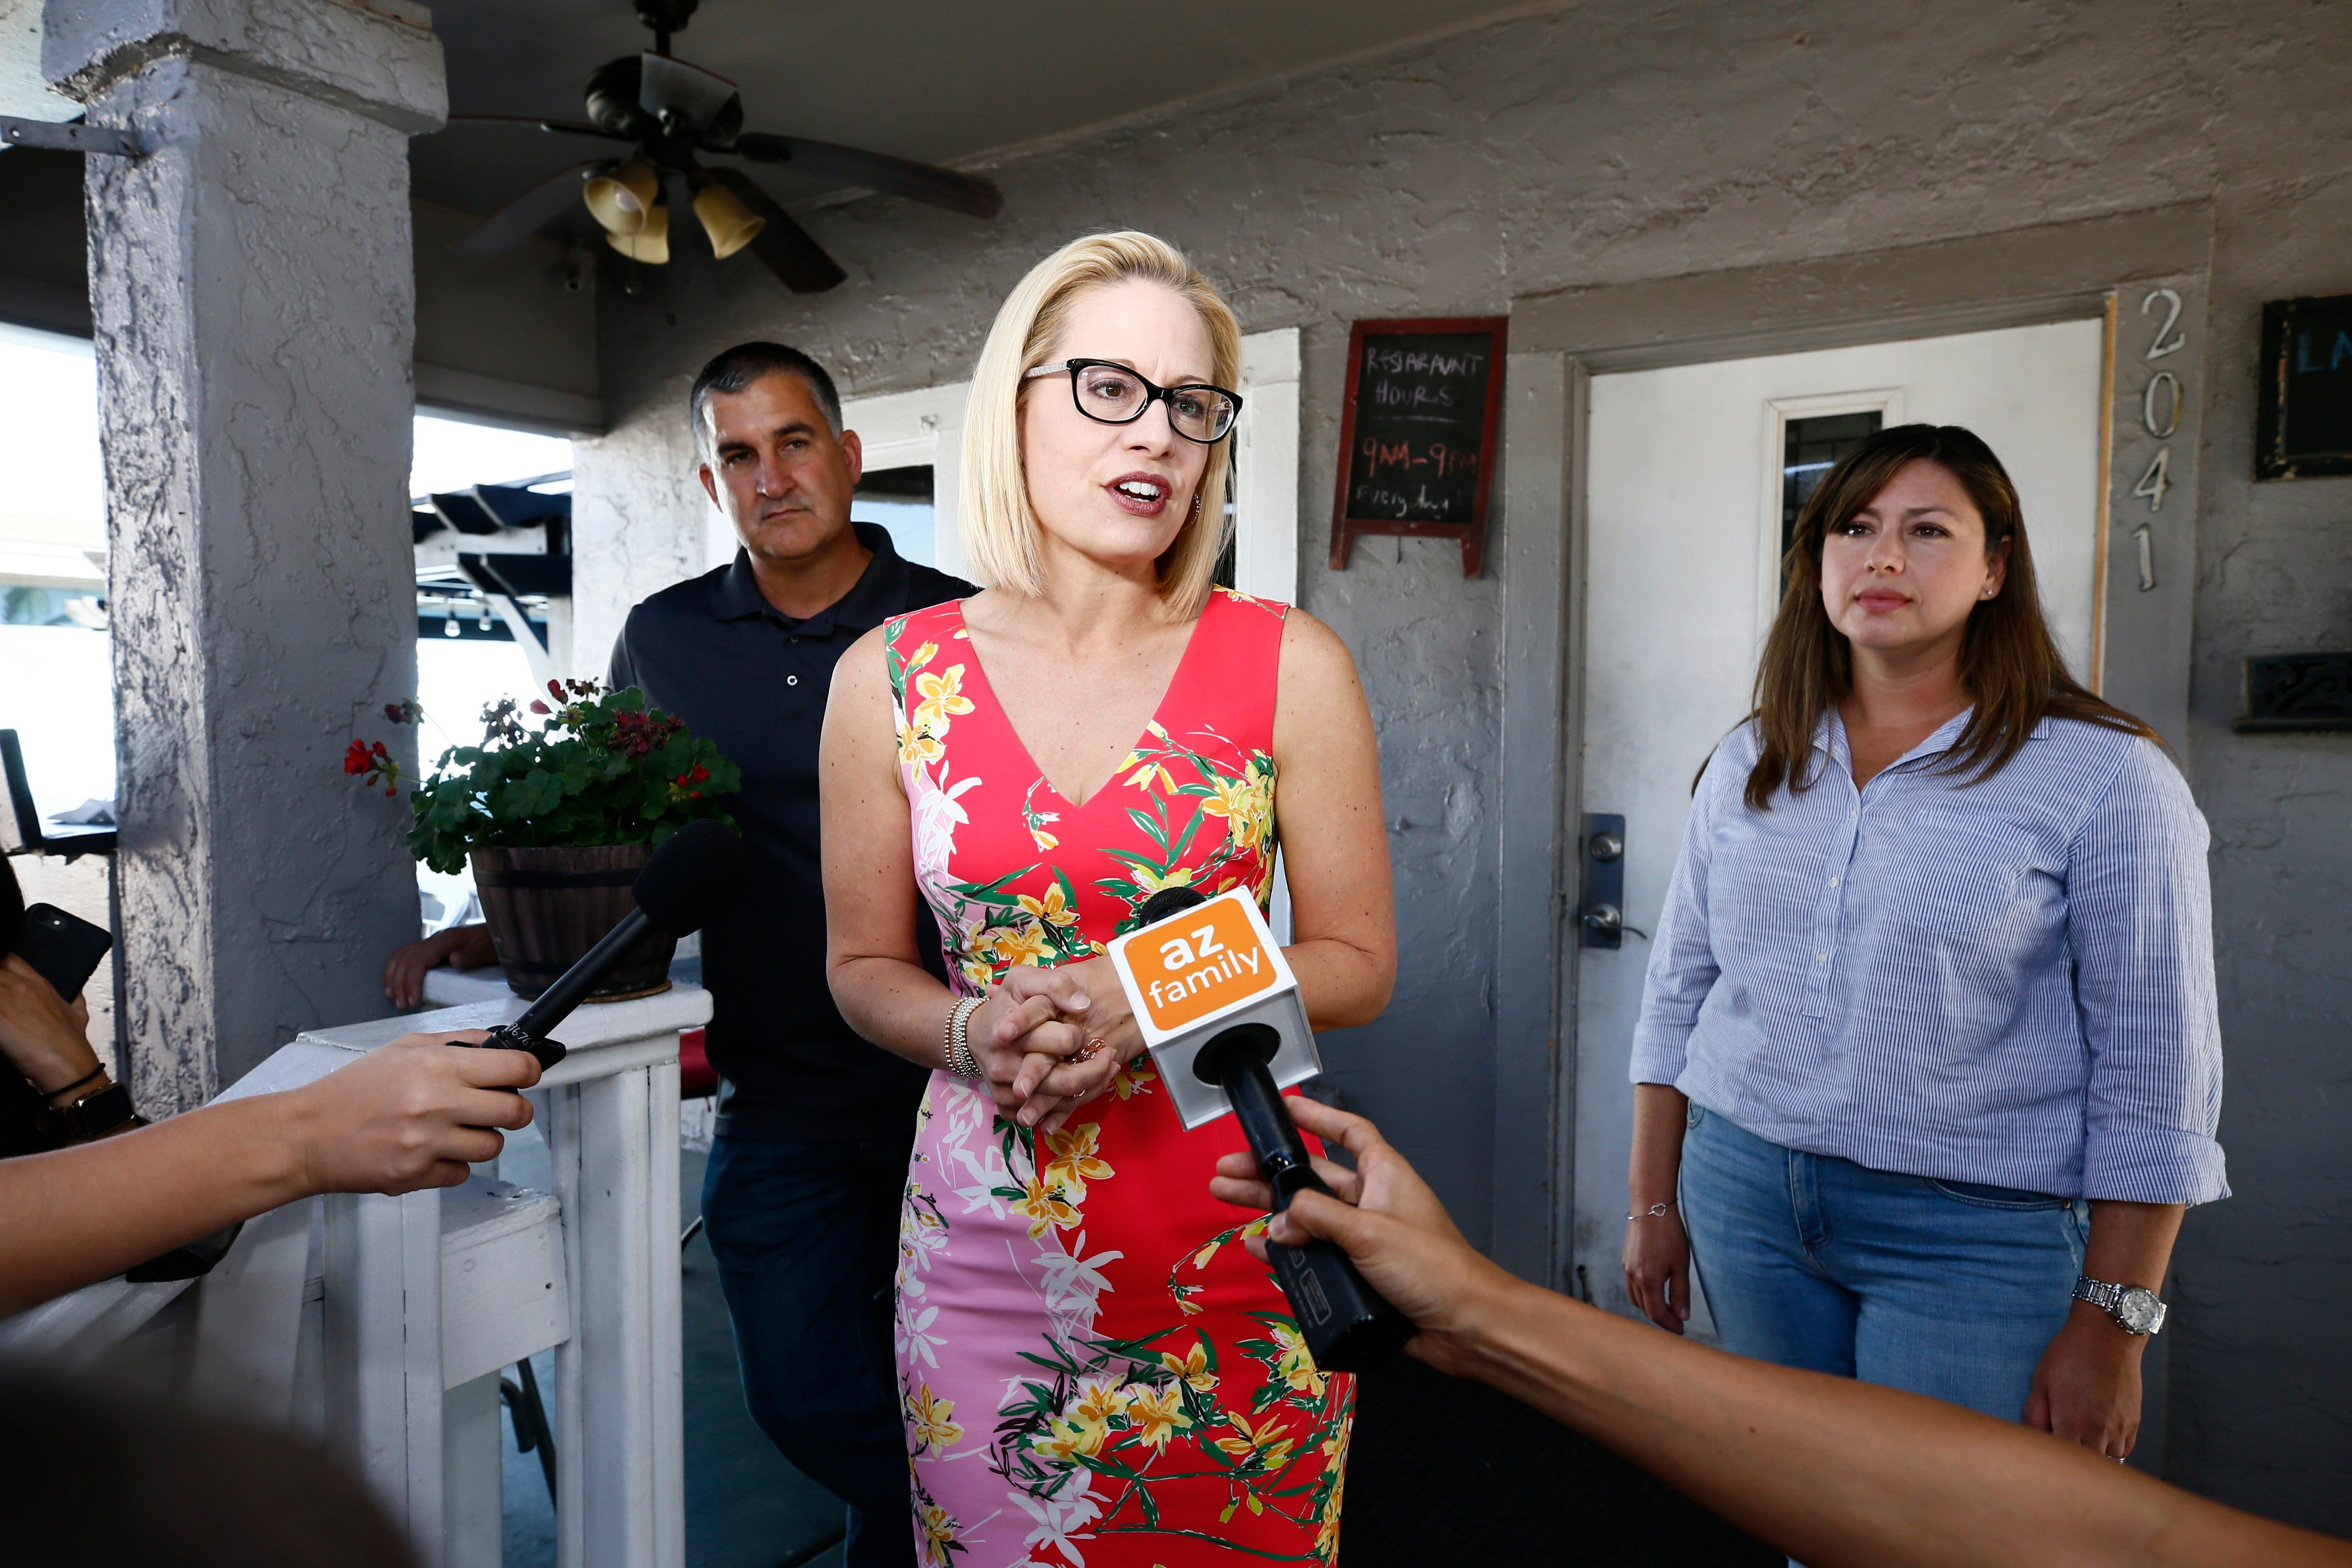 Kyrsten Sinema's lead over Martha McSally widens in roller-coaster U.S. Senate race to replace Jeff Flake | AZ Central